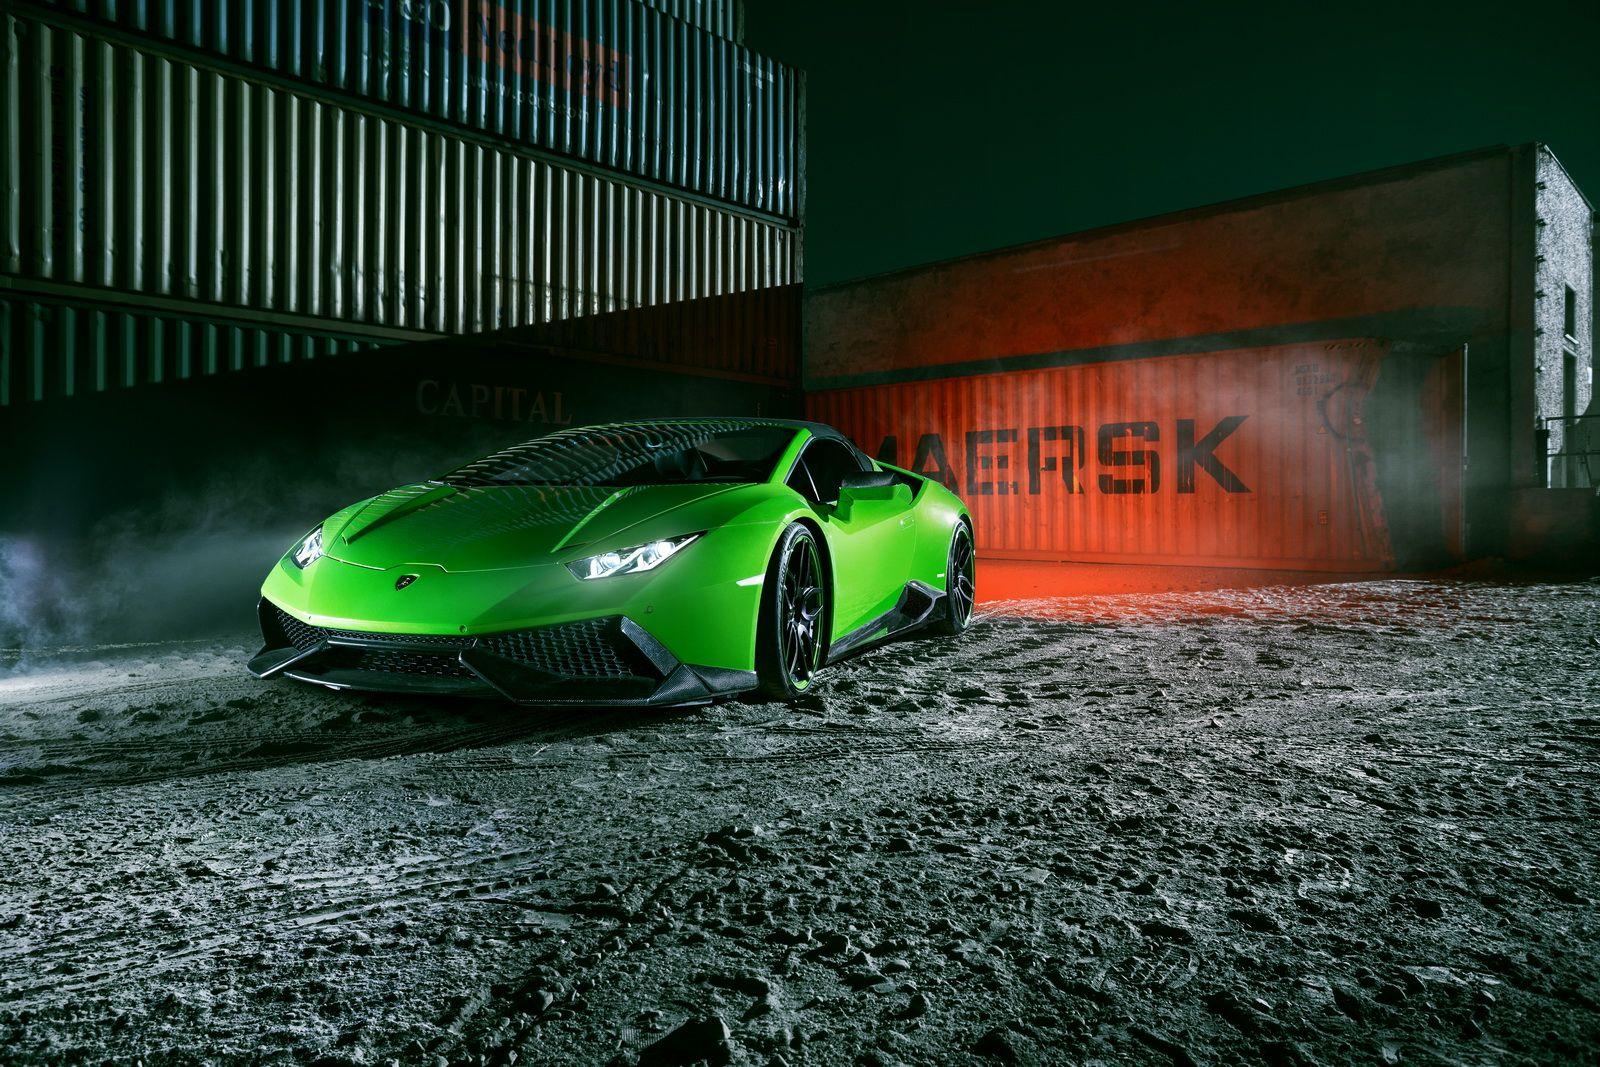 Novitec Torado S Lamborghini Huracan Spyder Throws 860 Hp Of Wind